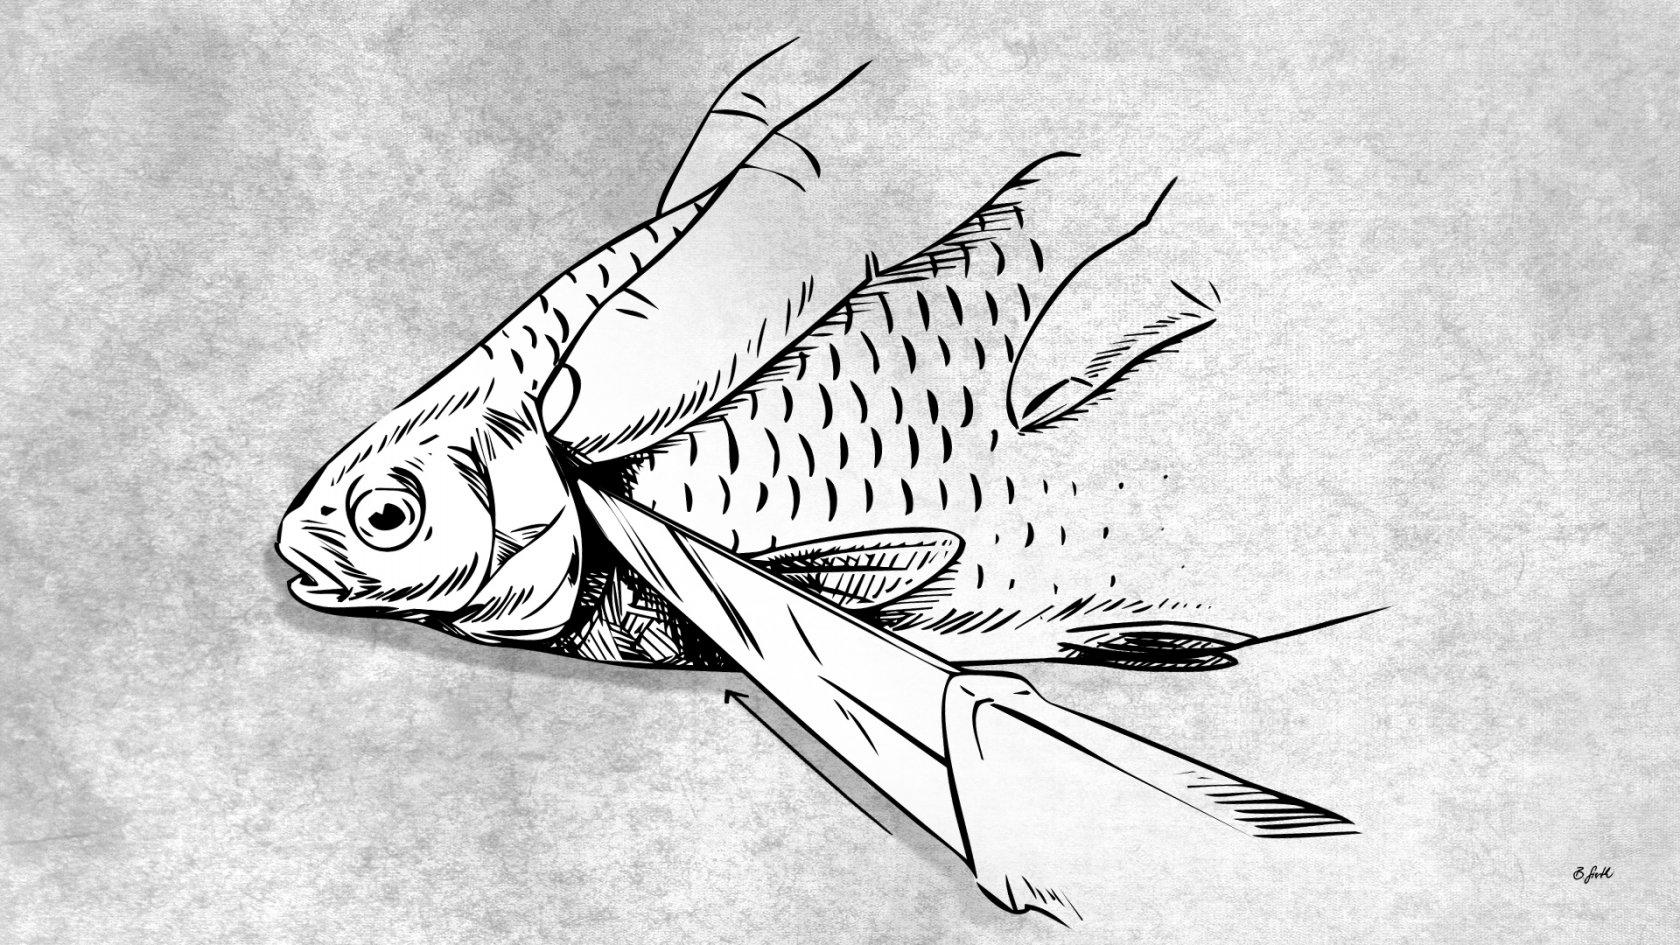 Fisch töten durch Kiemenschnitt